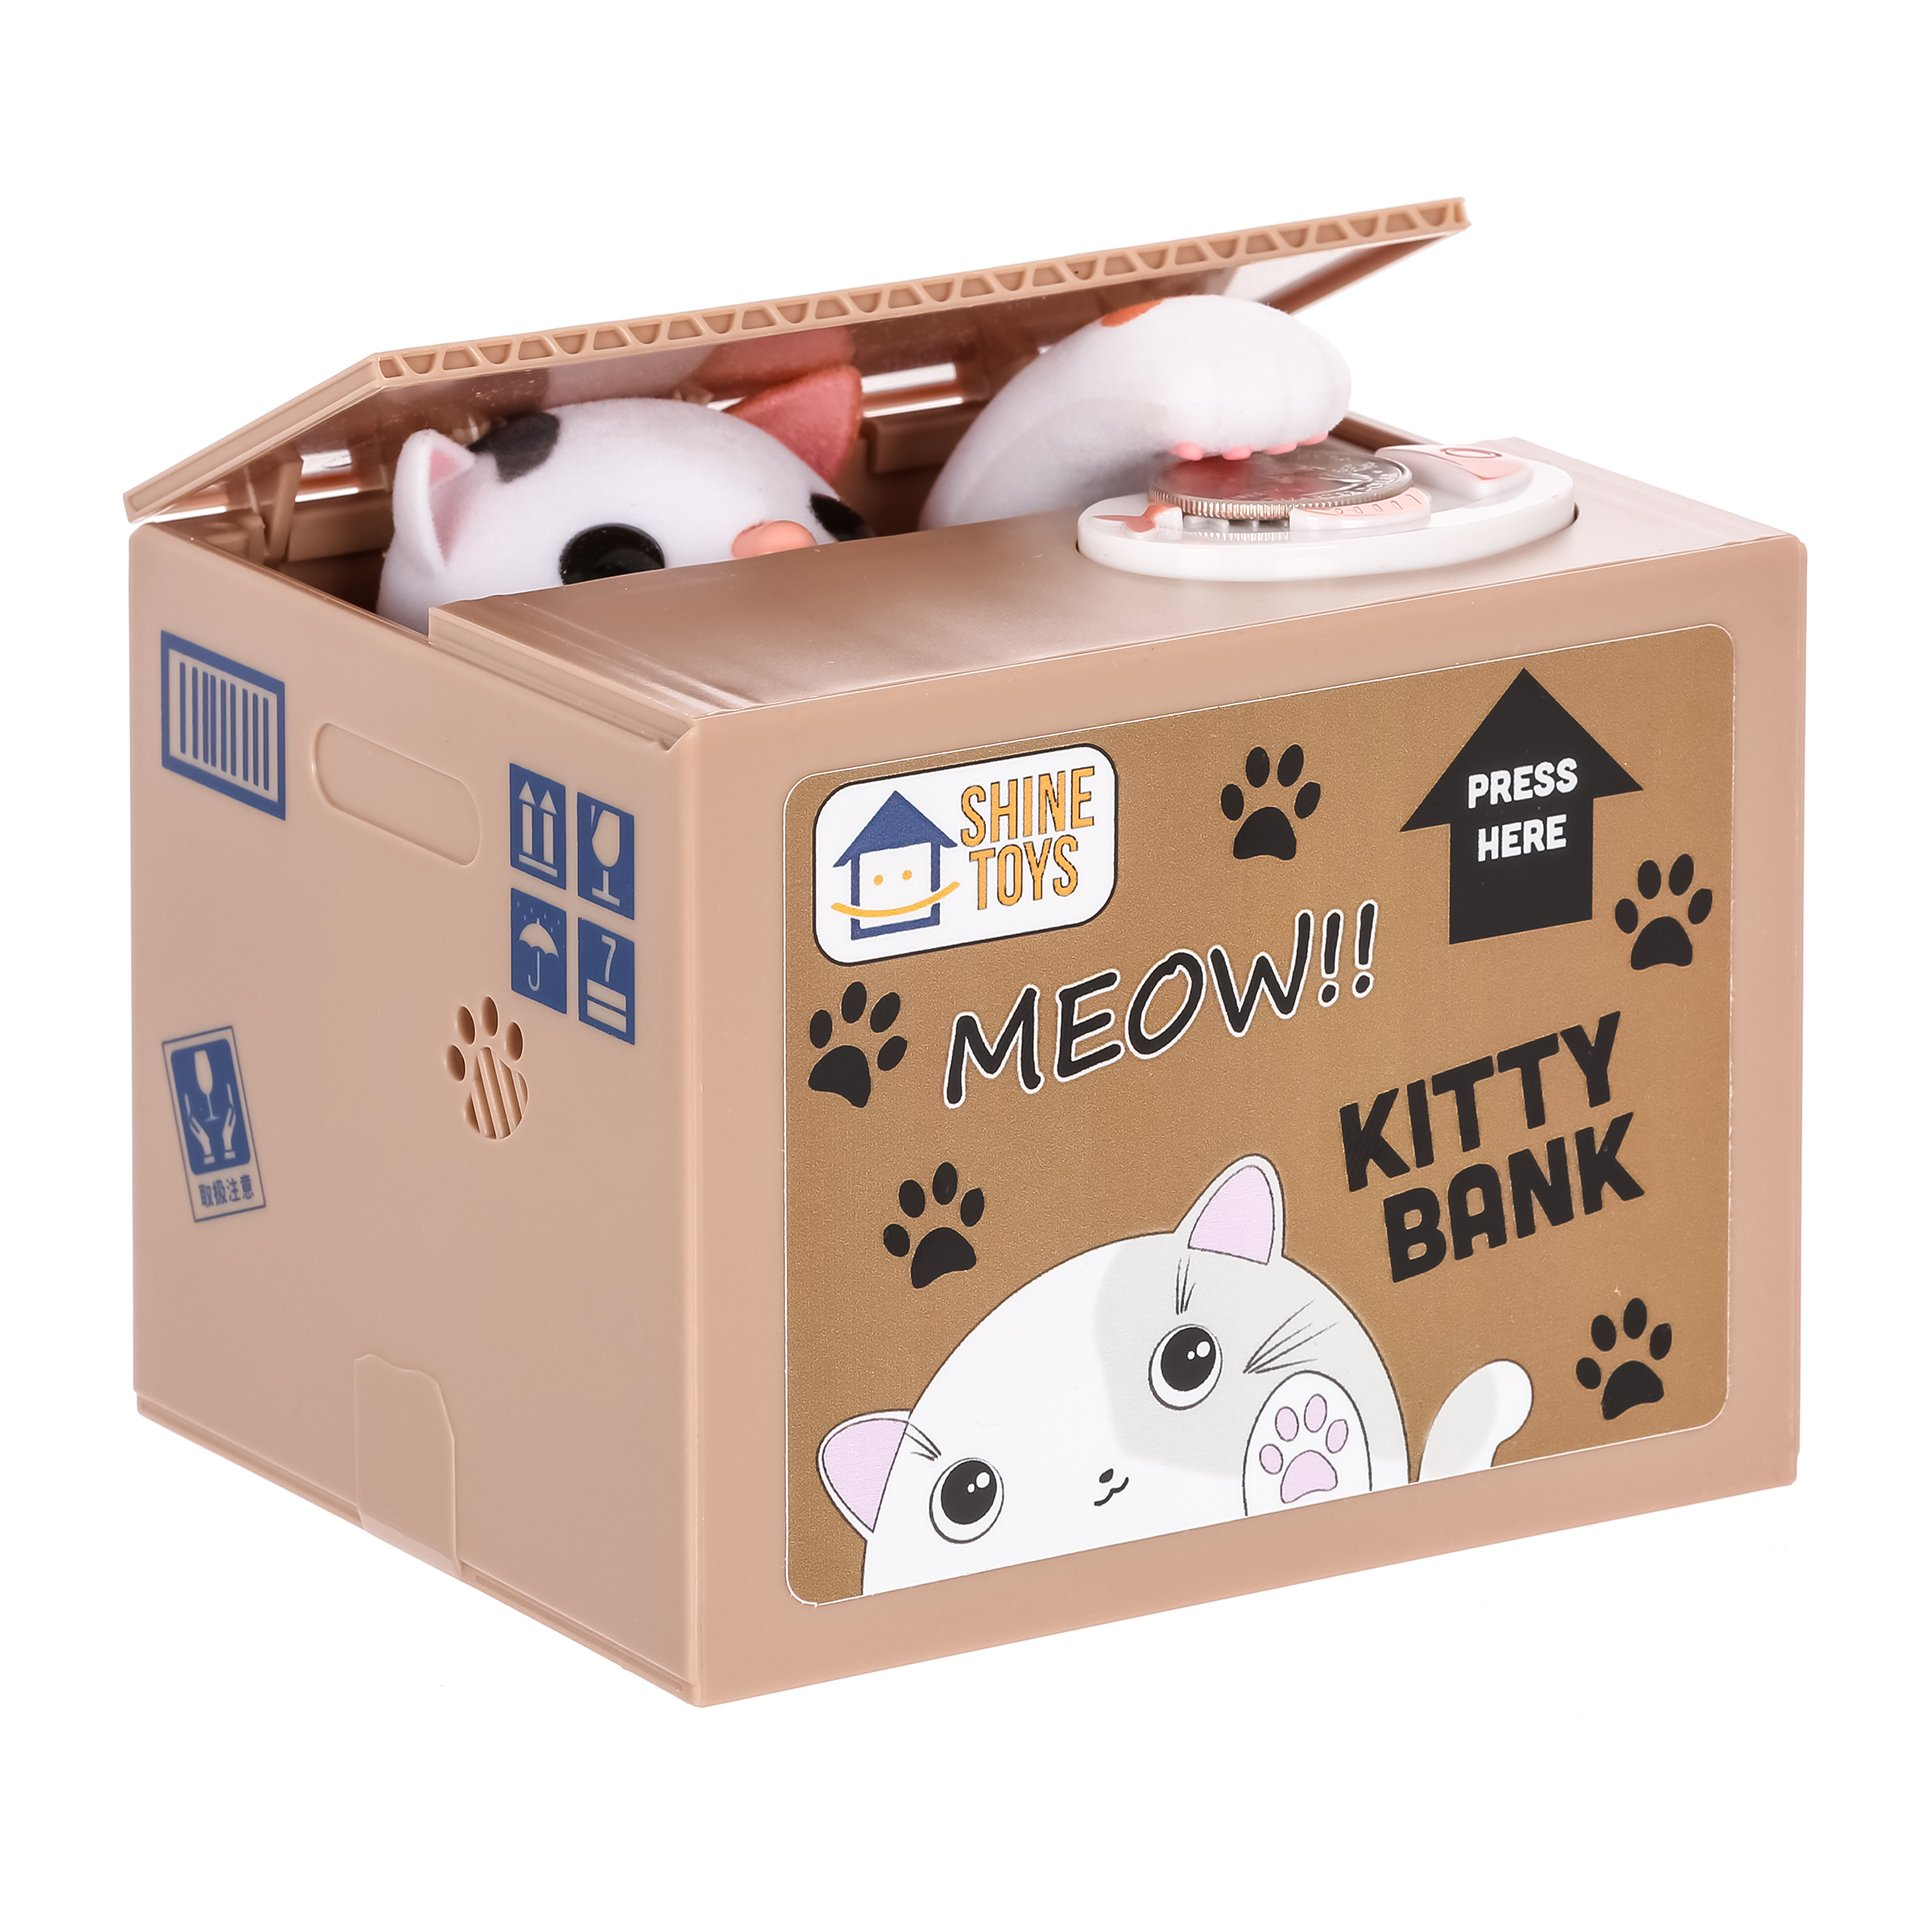 Itazura Coin Bank, Shine Toys Stealing Money Piggy Bank White Kitty